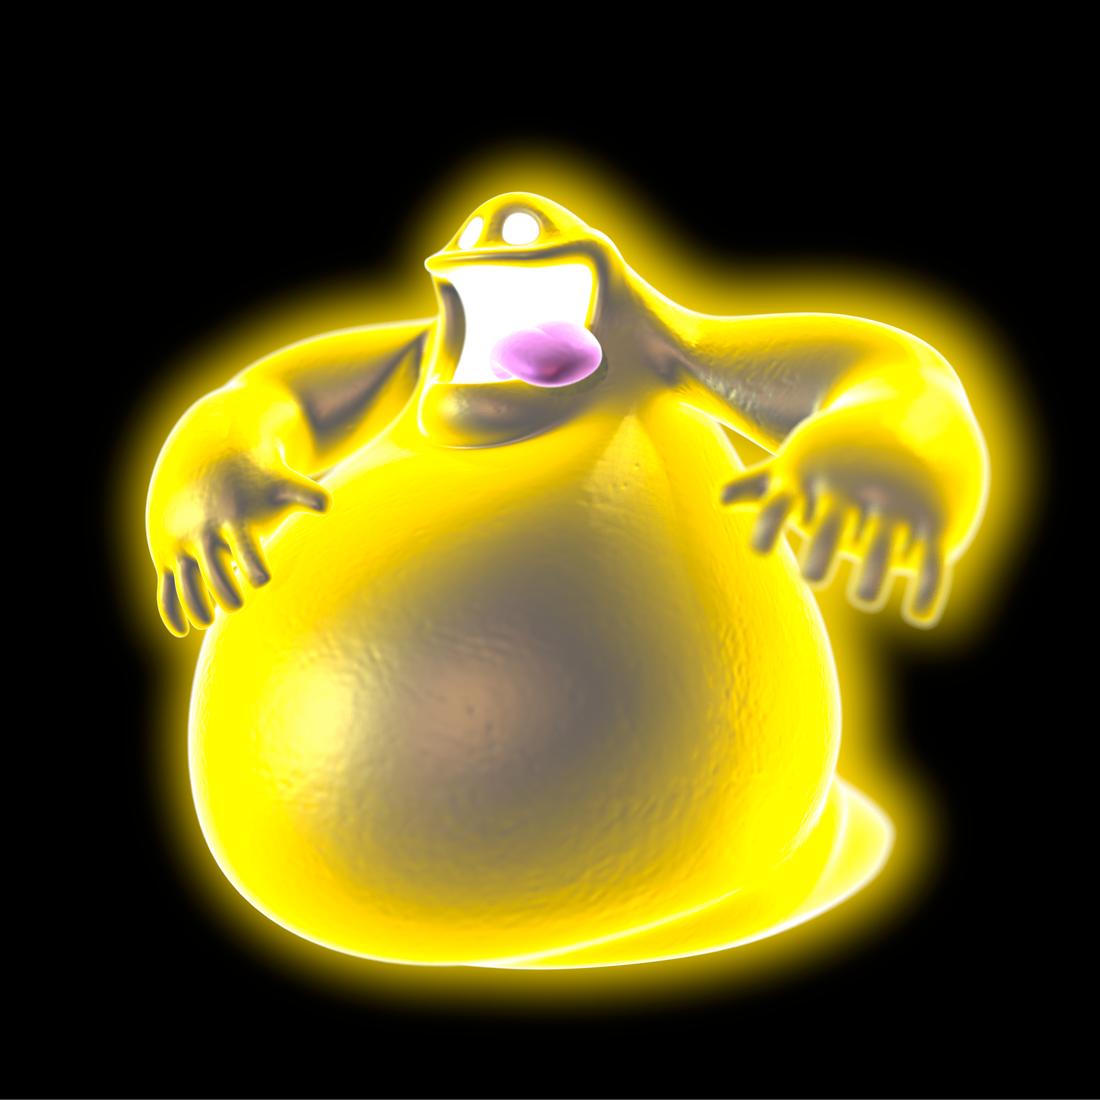 Luigi's Mansion Dark Moon review lost souls(画像あり) マリオ